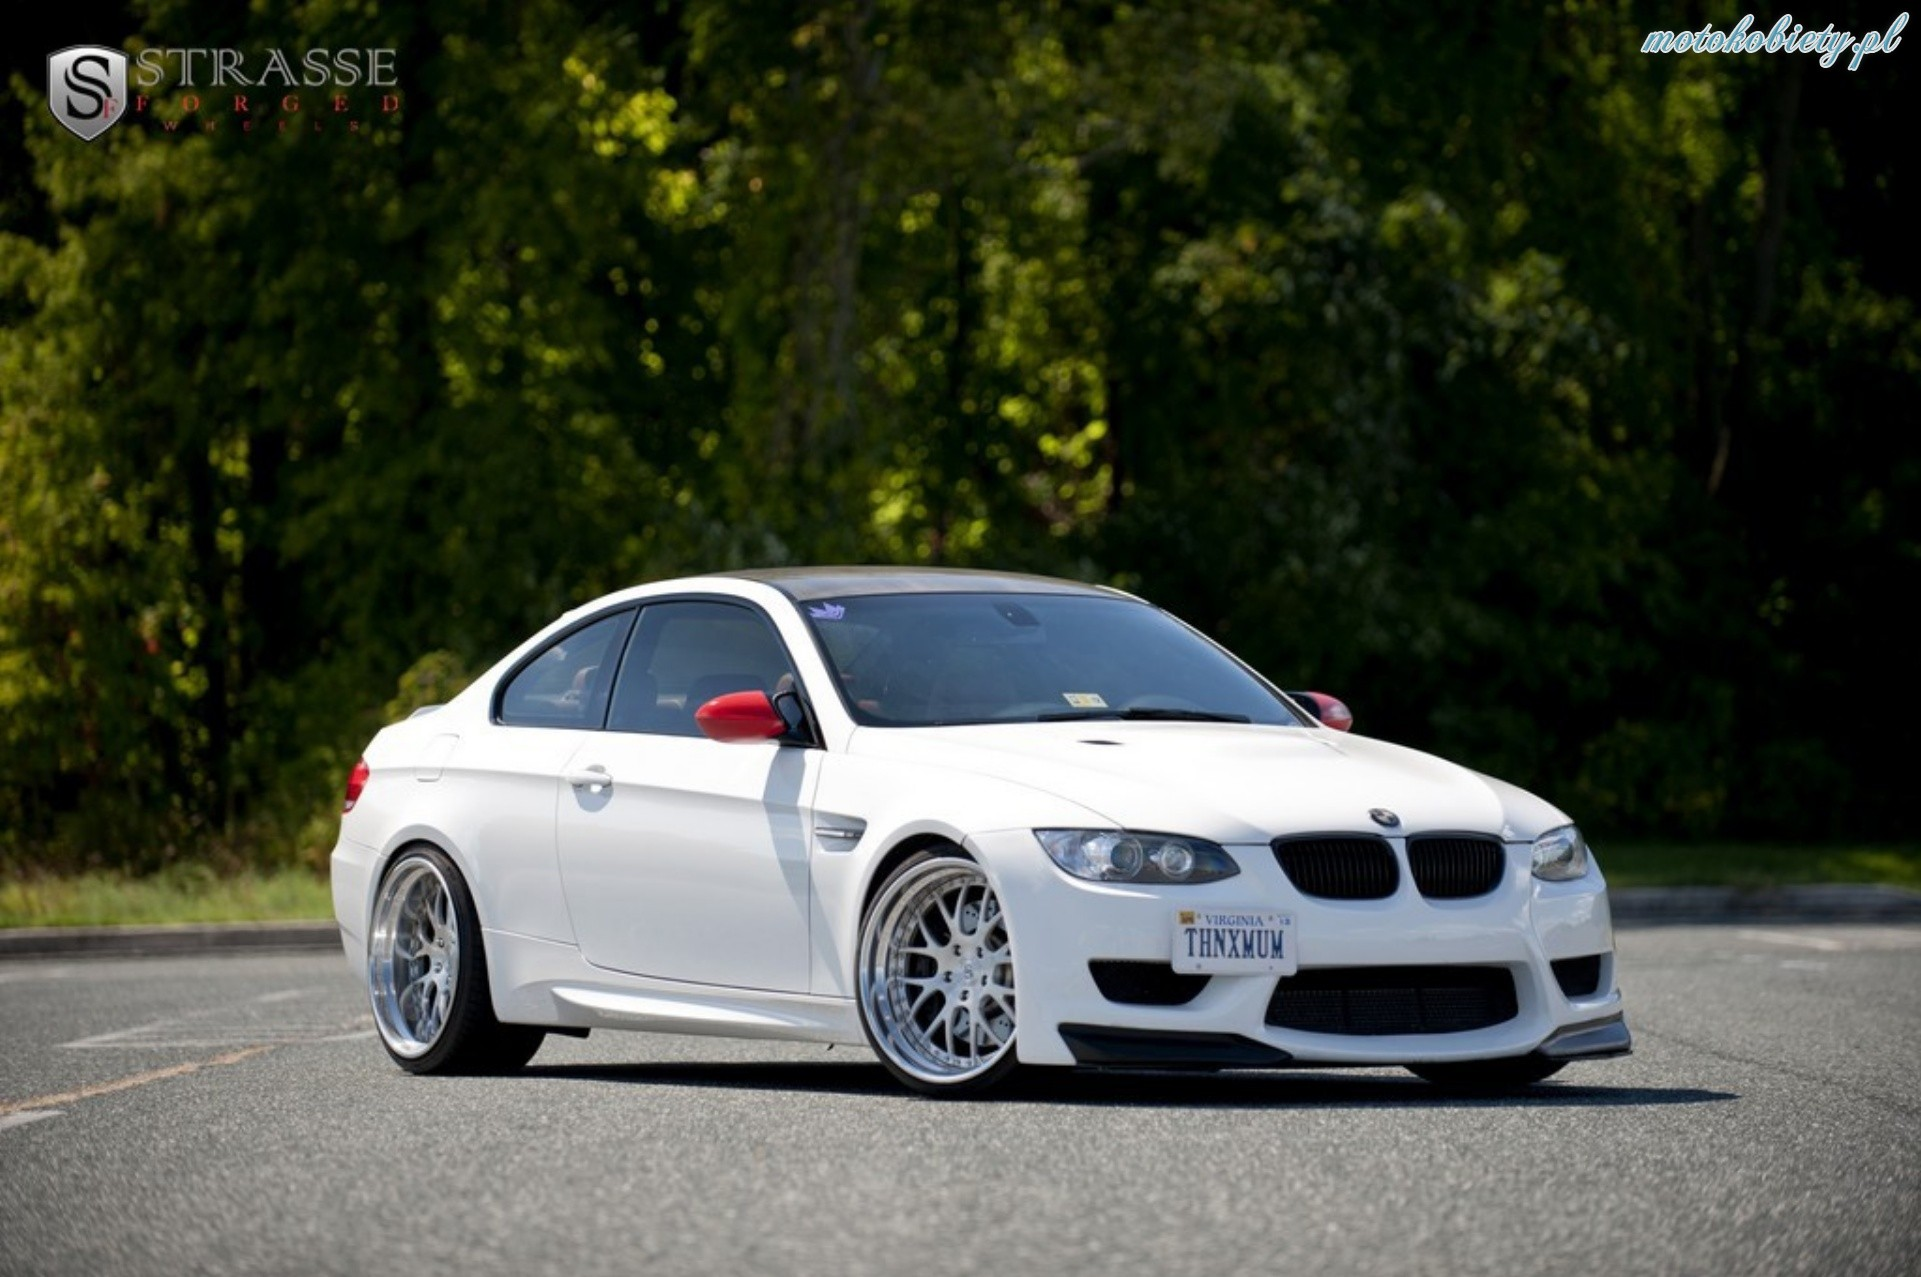 Strasse Forged BMW M3